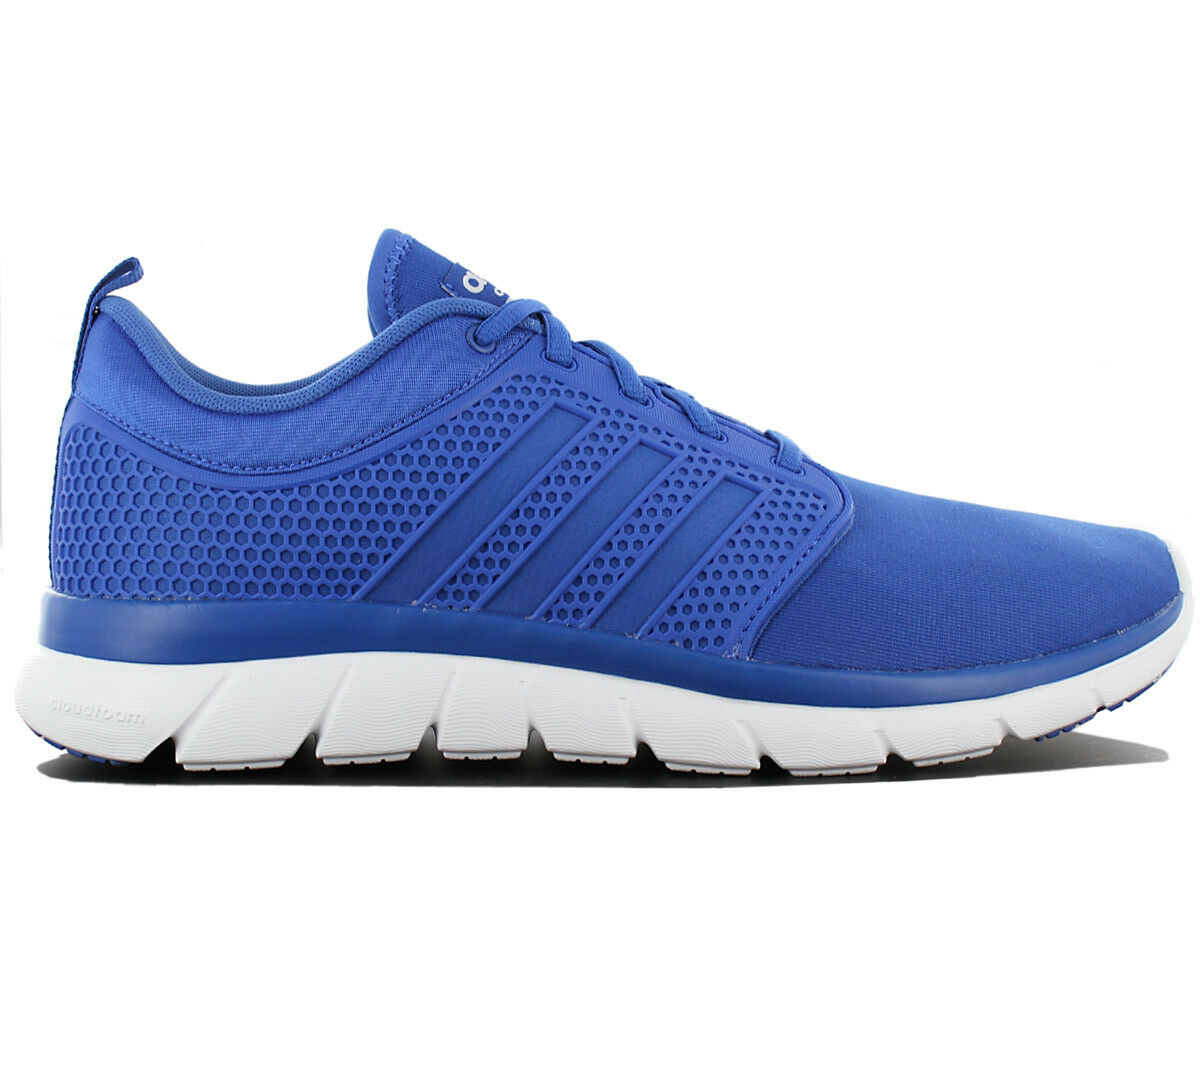 Adidas Cloudfoam Groove Sportive Sneaker Scarpe Uomo Fitness Scarpe Sportive Groove AQ1424 Nuovo ccc0f5